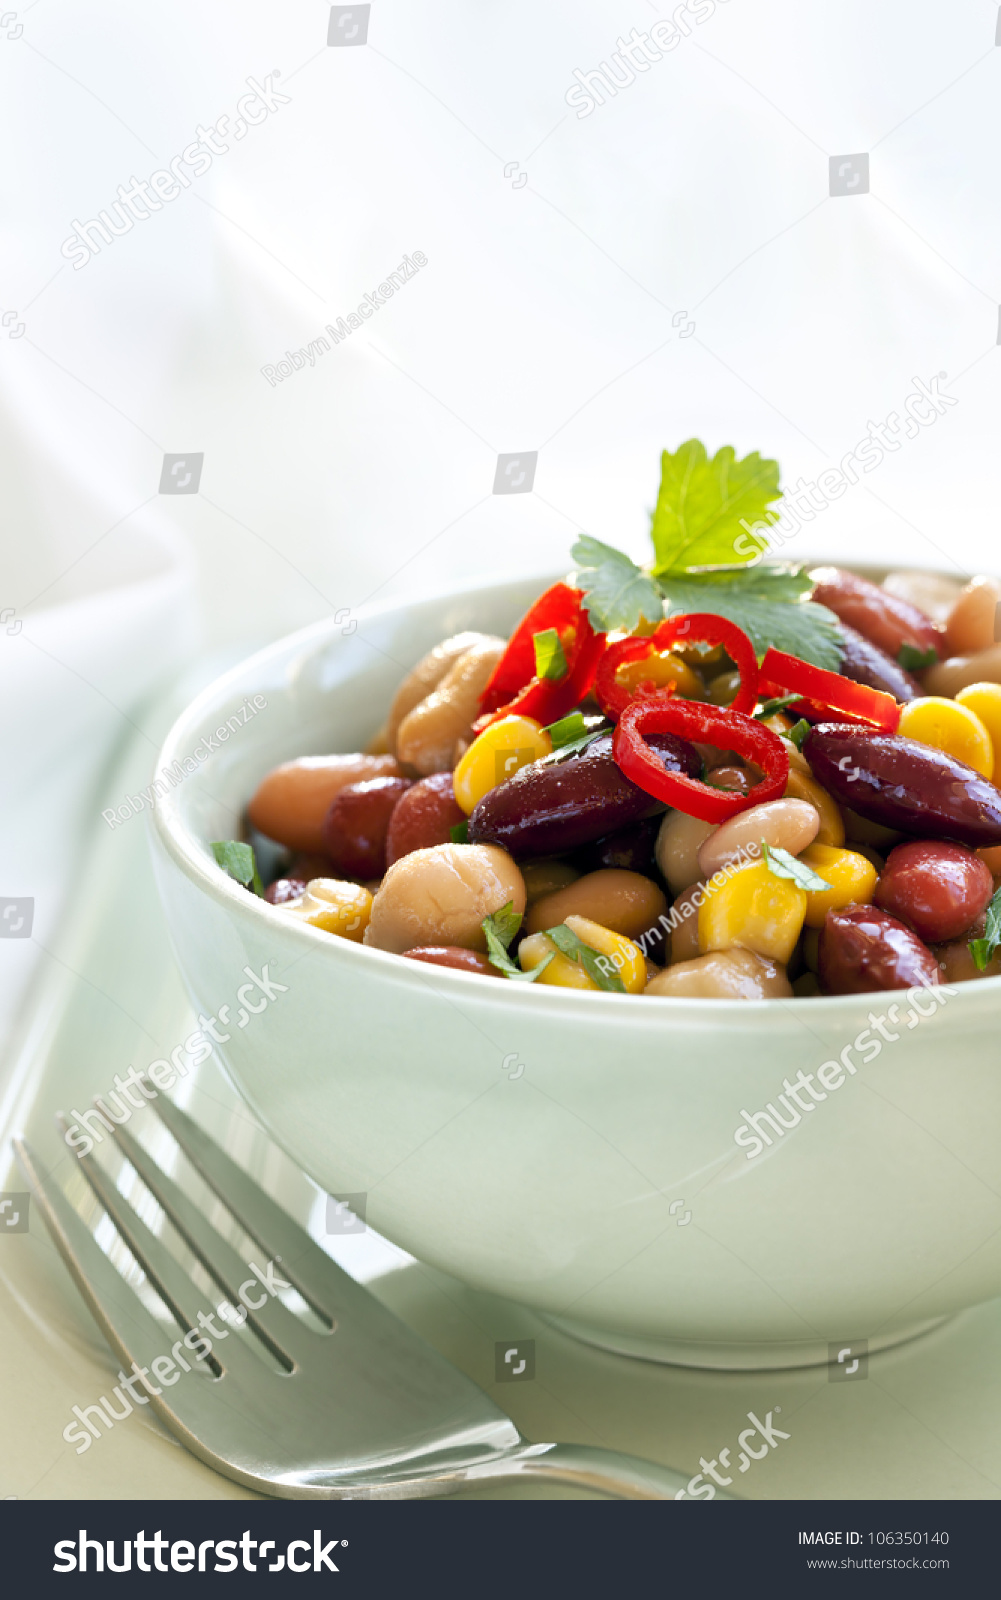 Bean Corn Salad Topped Chili Delicious Stock Photo ...